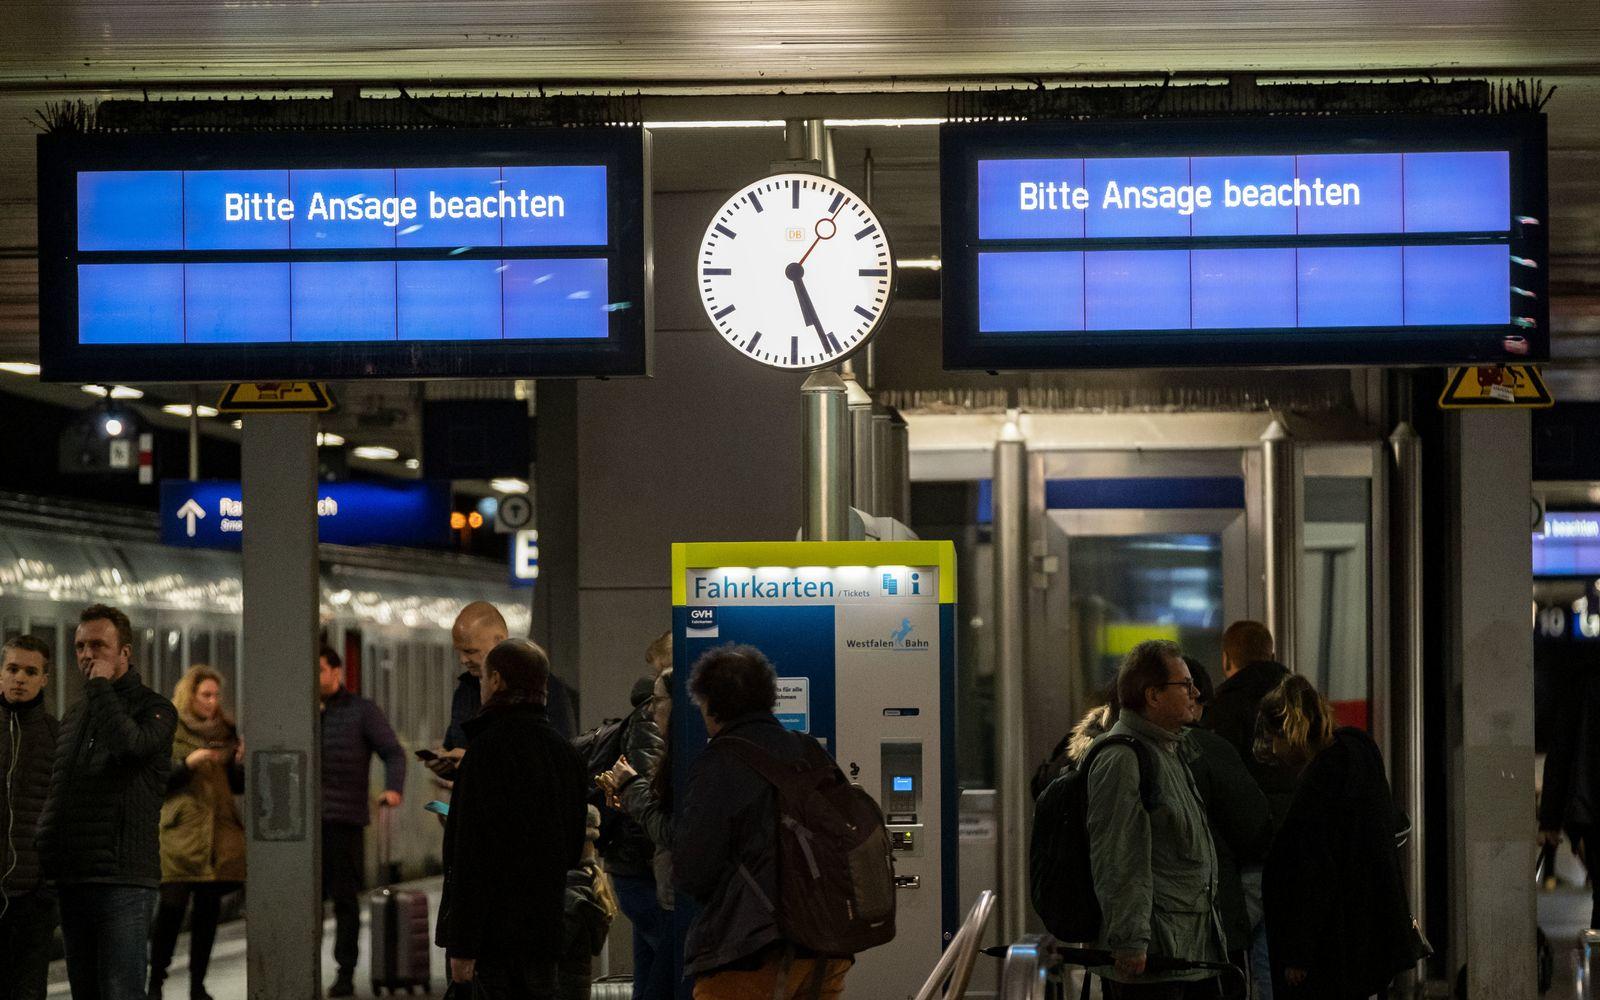 Bahnverkehr in Hannover ruht wegen Stellwerksausfalls